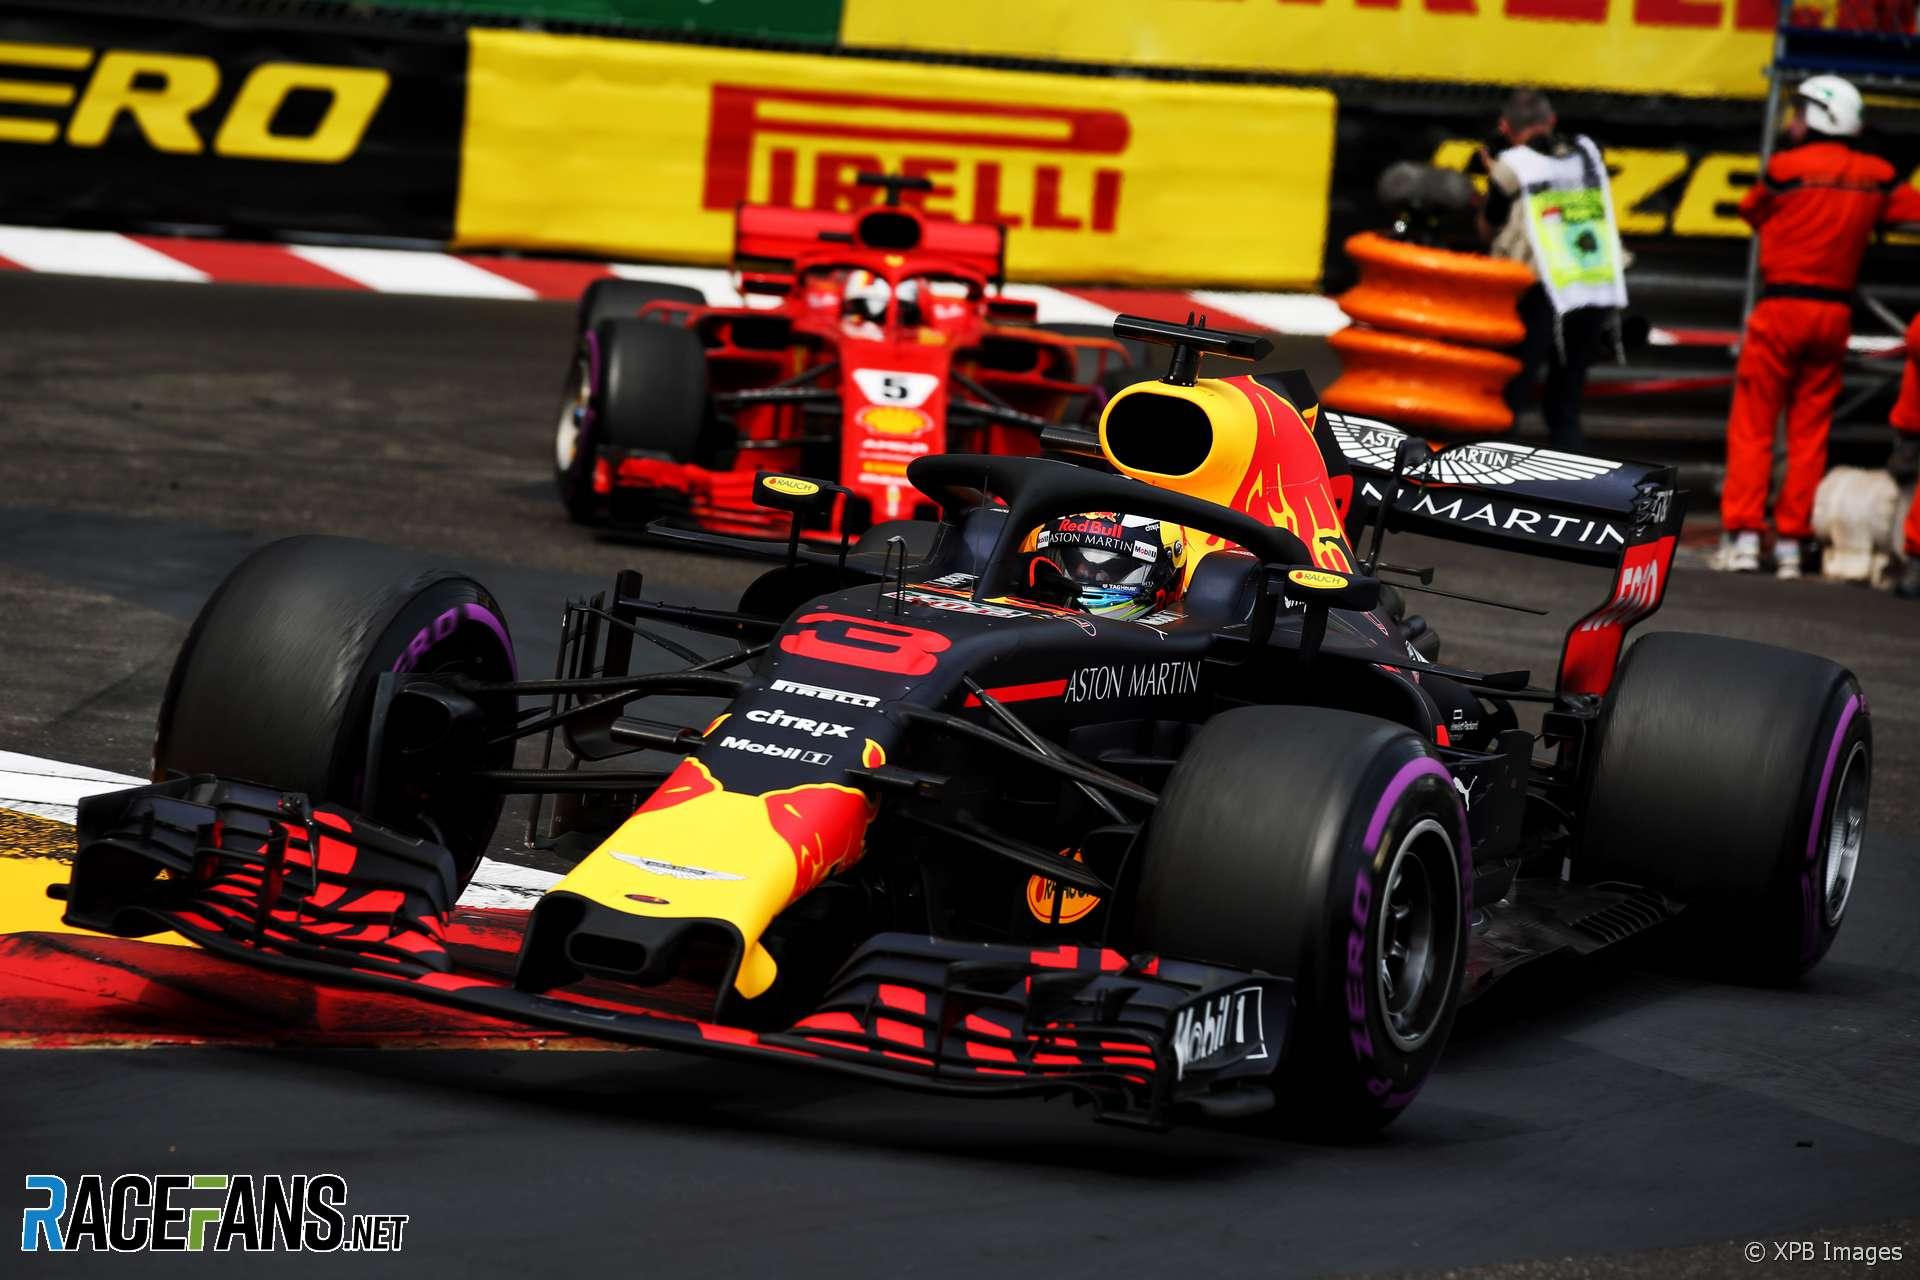 Daniel Ricciardo, Red Bull, Monaco, 2018